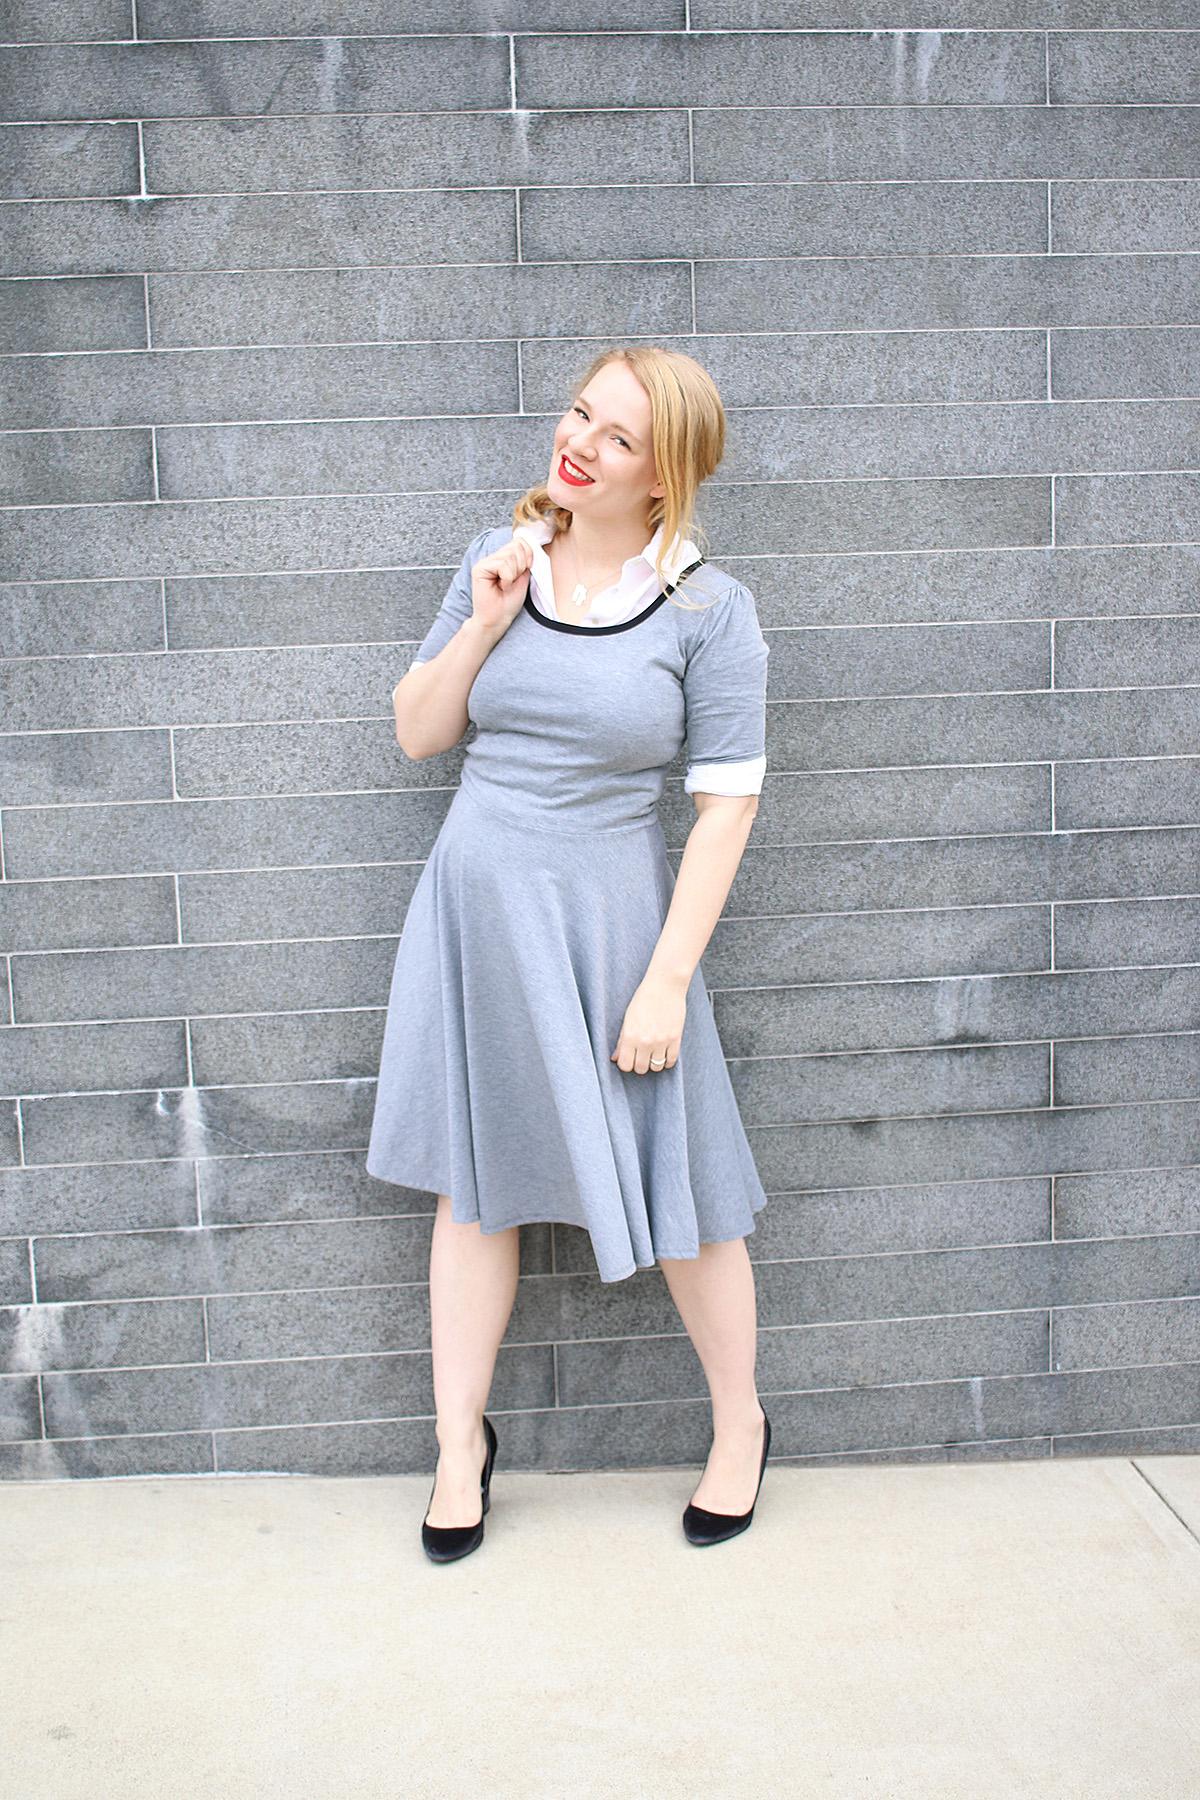 LuLaRoe Nicole Dress with Button Down